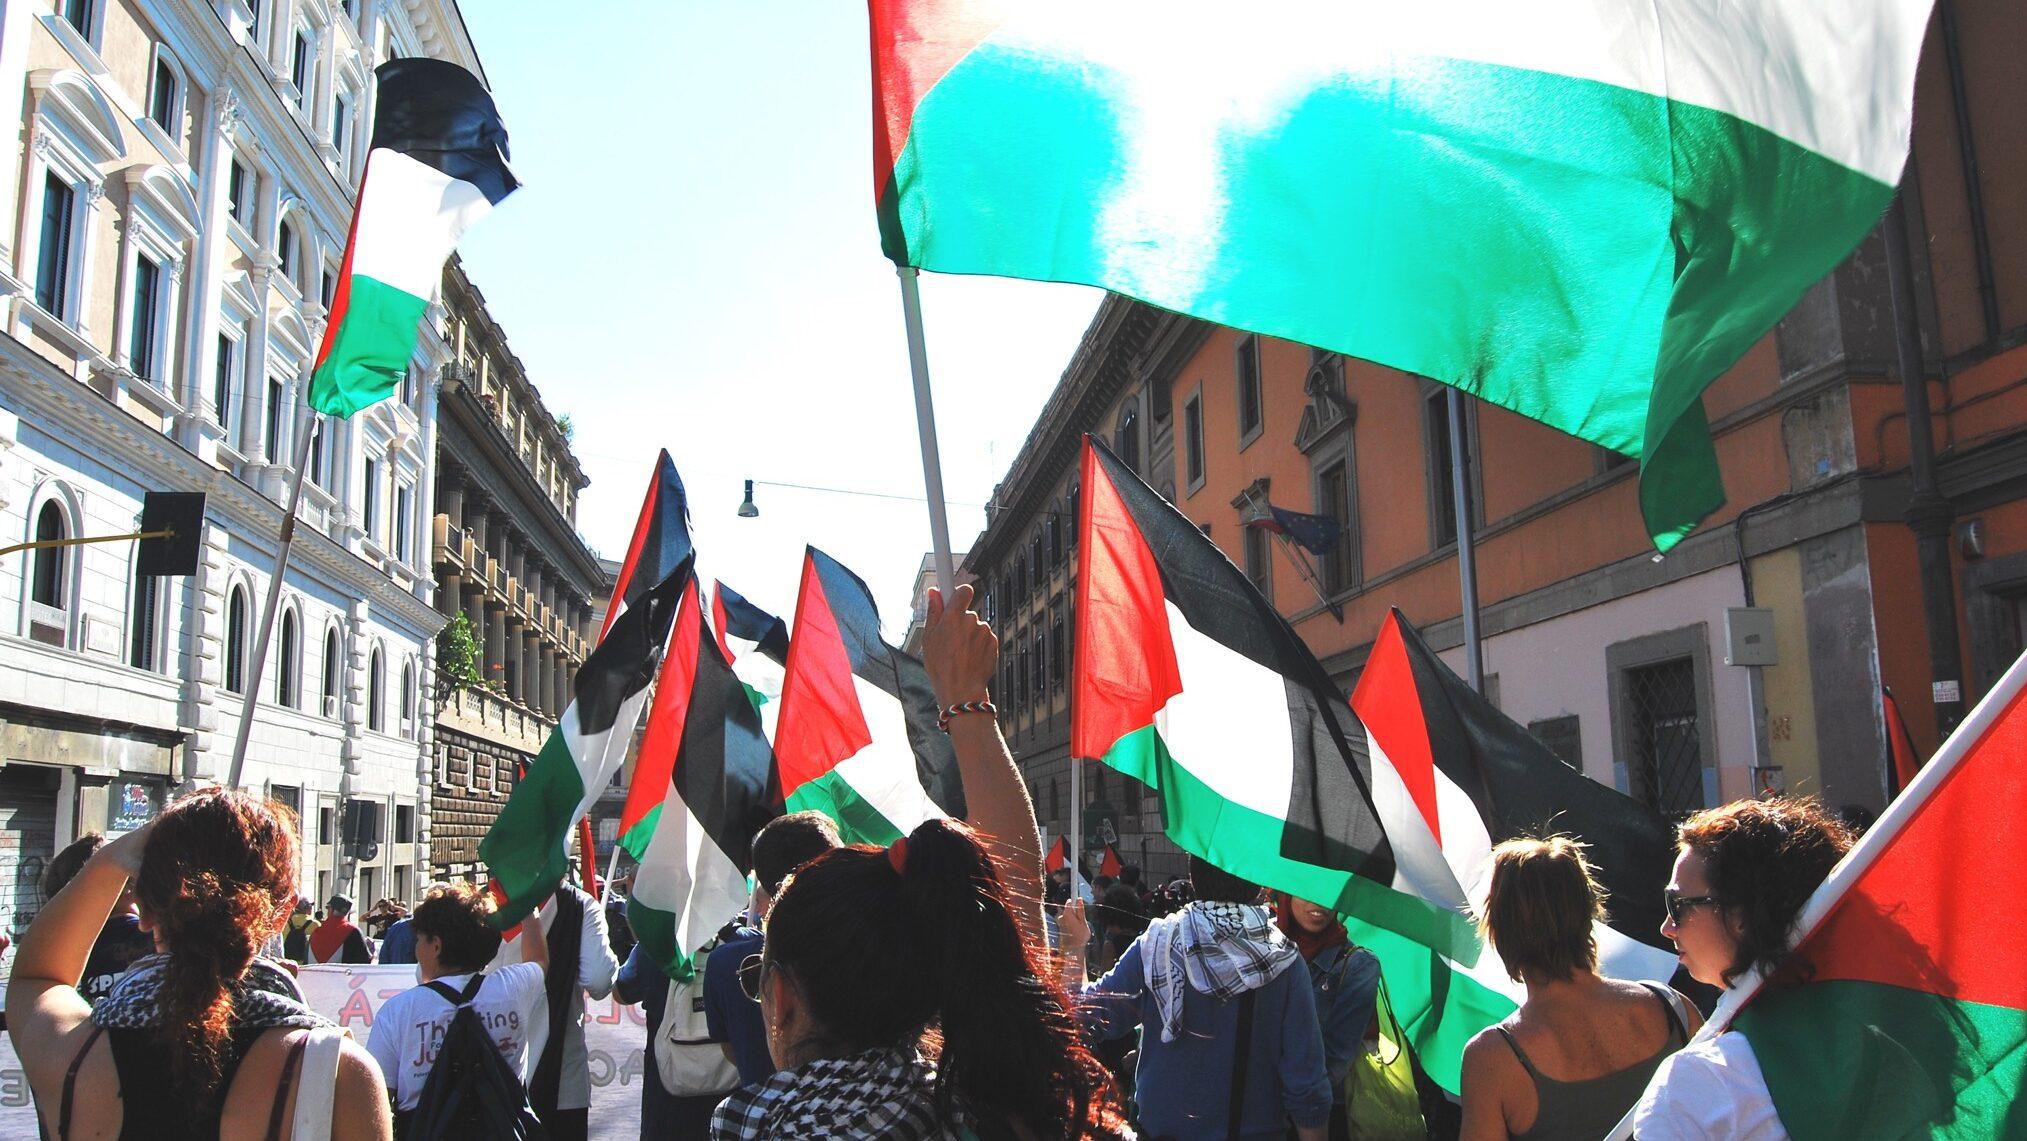 Contro l'apartheid israeliana, per i diritti dei palestinesi